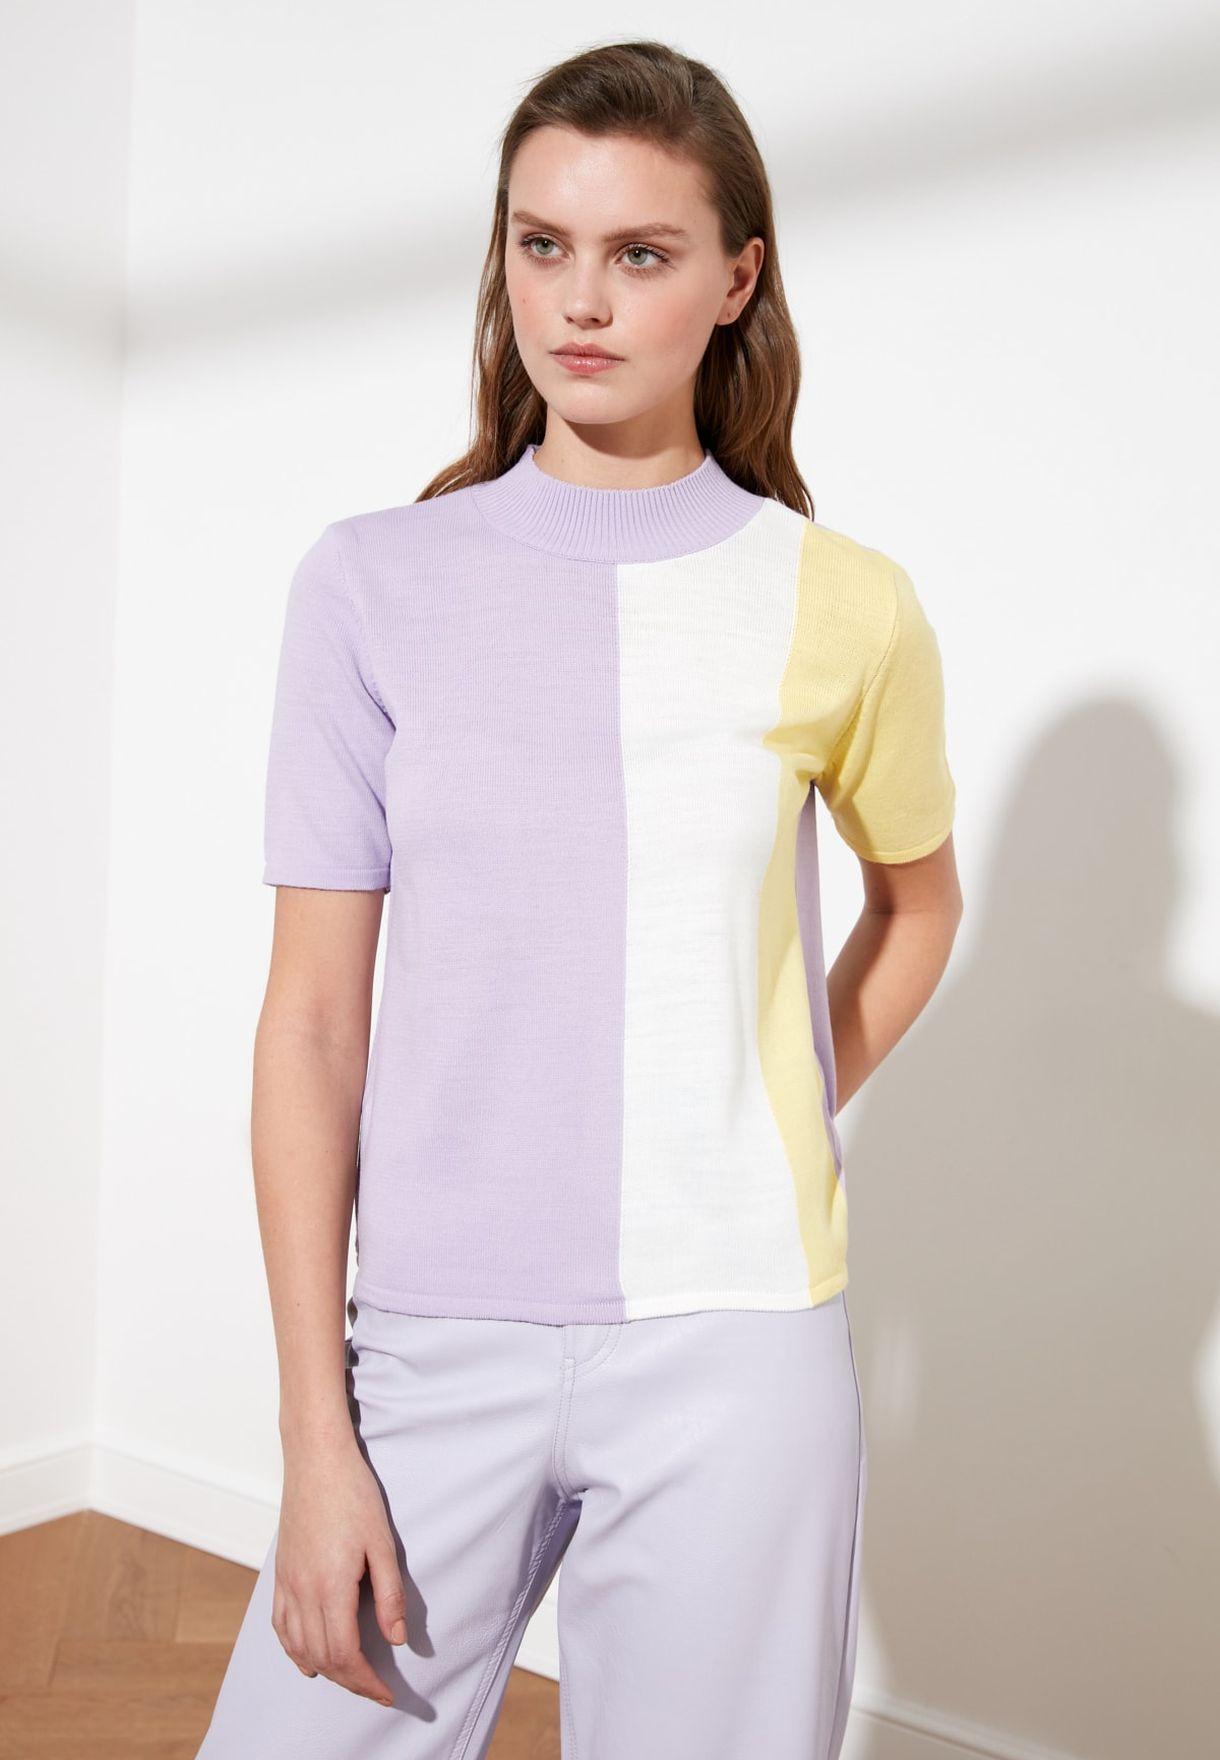 High Neck Colorblock Sweater